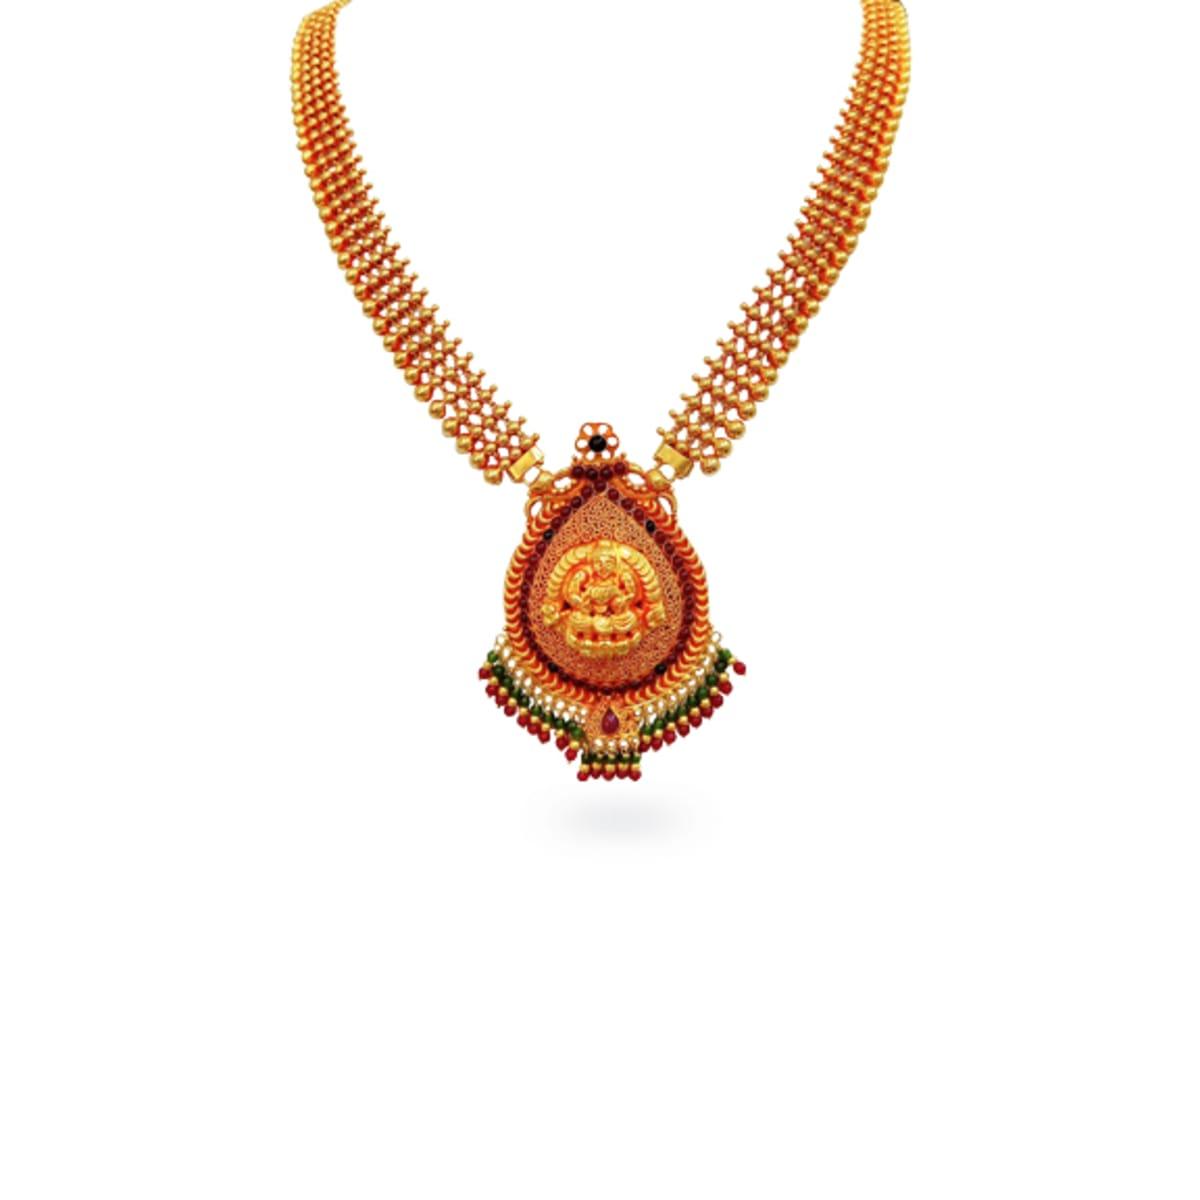 Antique Mahalakshmi Haram